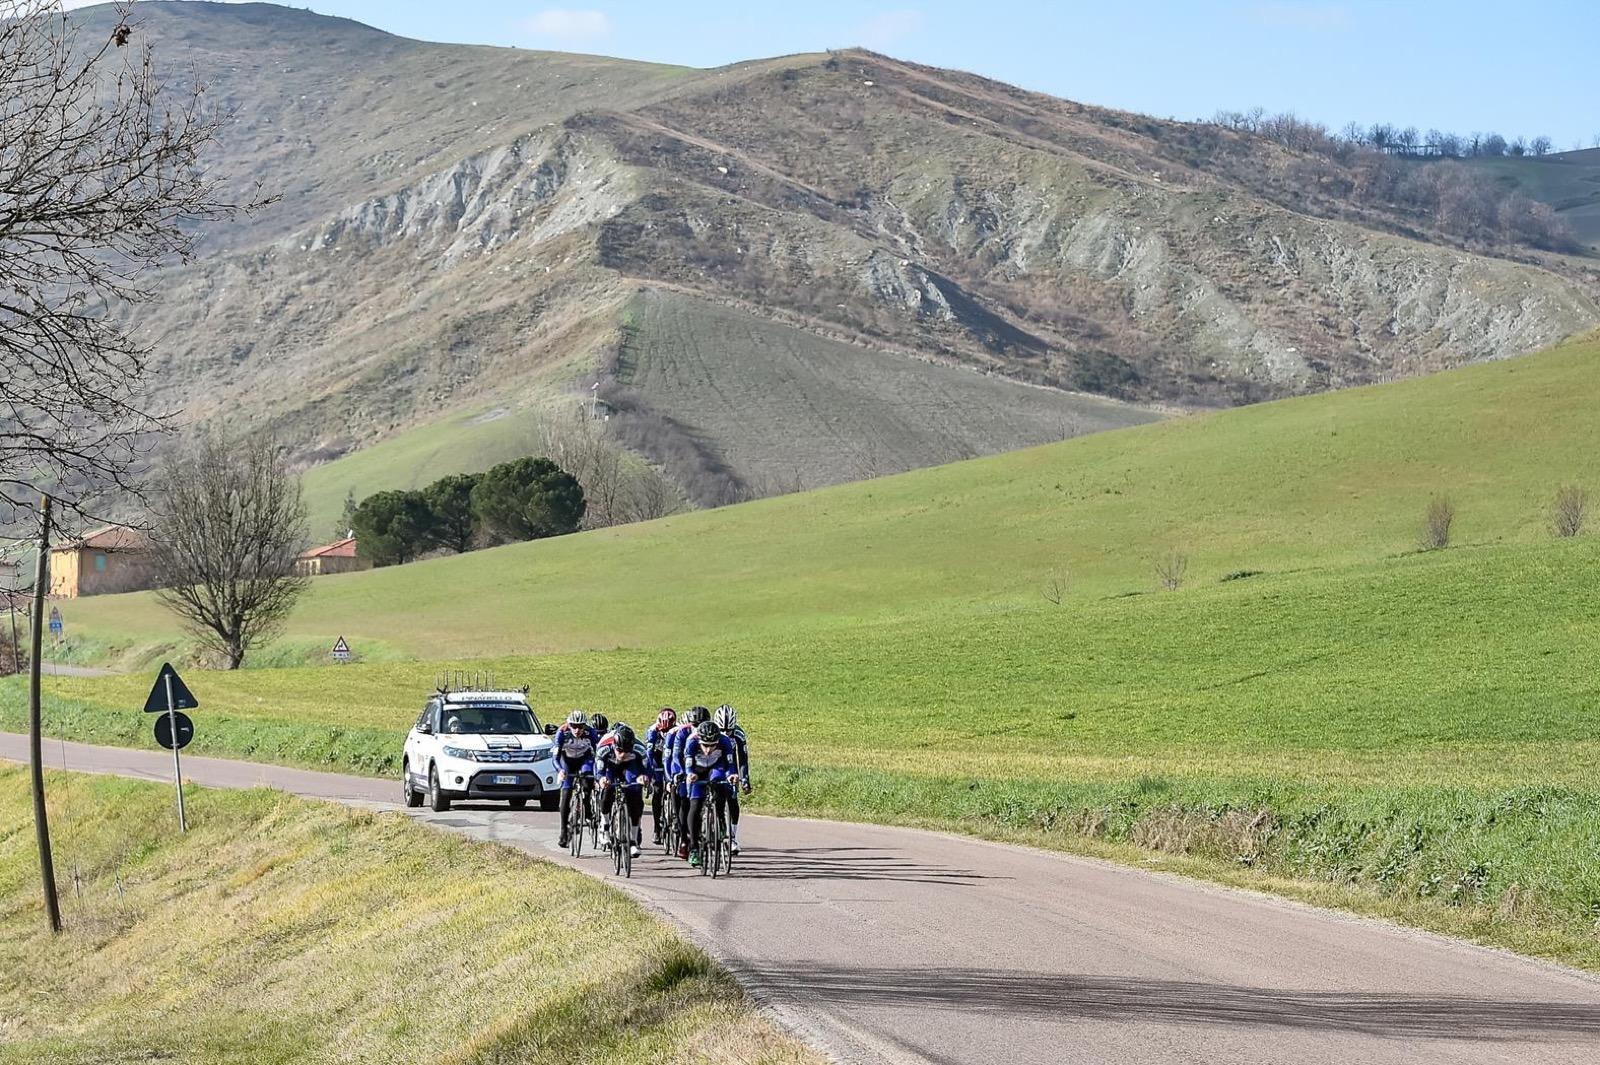 inEmiliaRomagna CyclingTeam